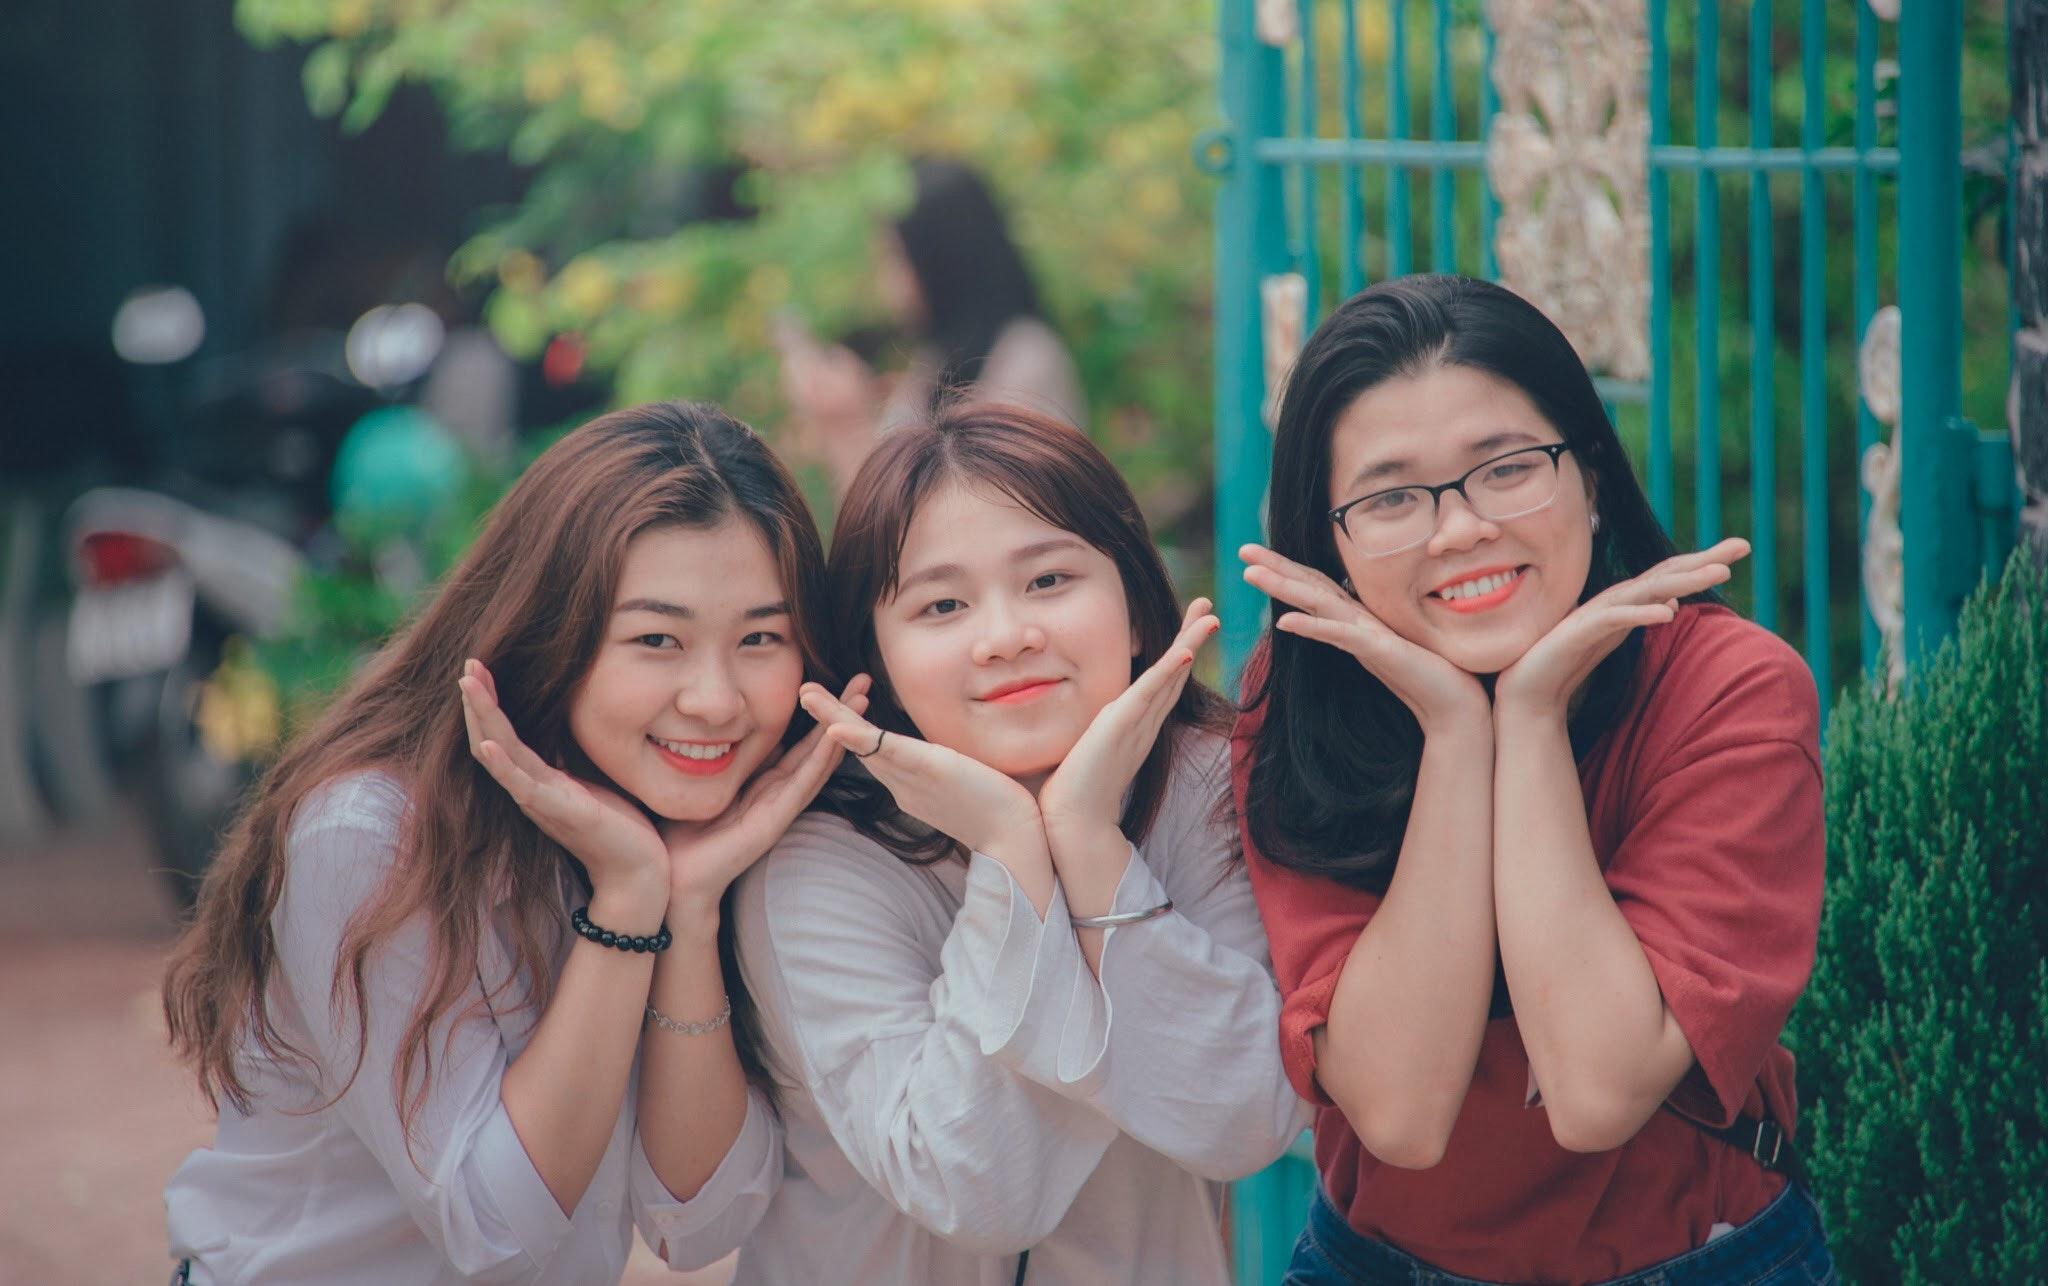 Three Girl's Wearing White and Red Dress Shirts, Blurred background, Enjoyment, Eyewear, Friendship, HQ Photo